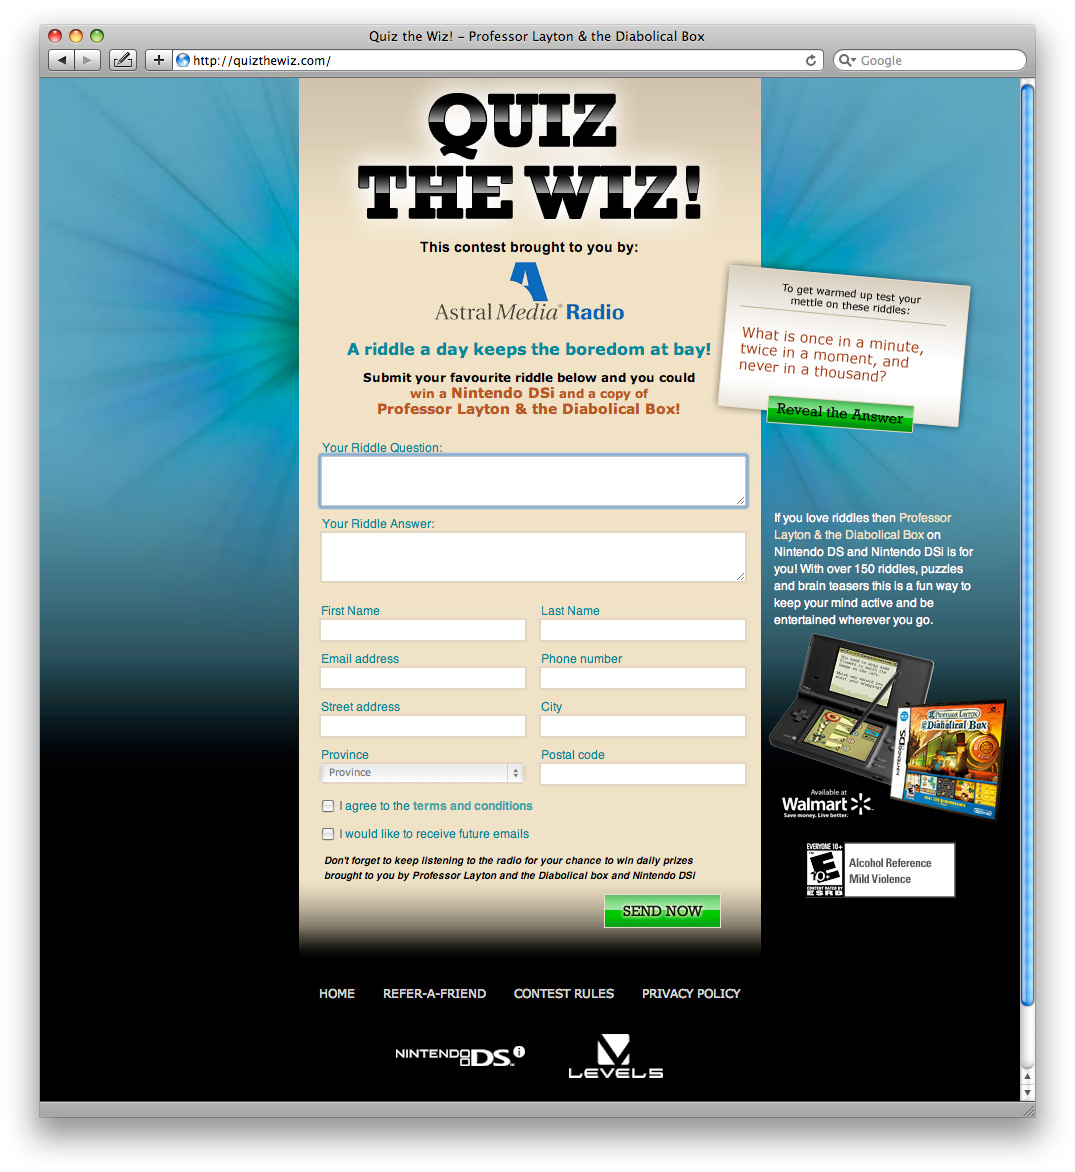 Contest website design by Swerve, Toronto